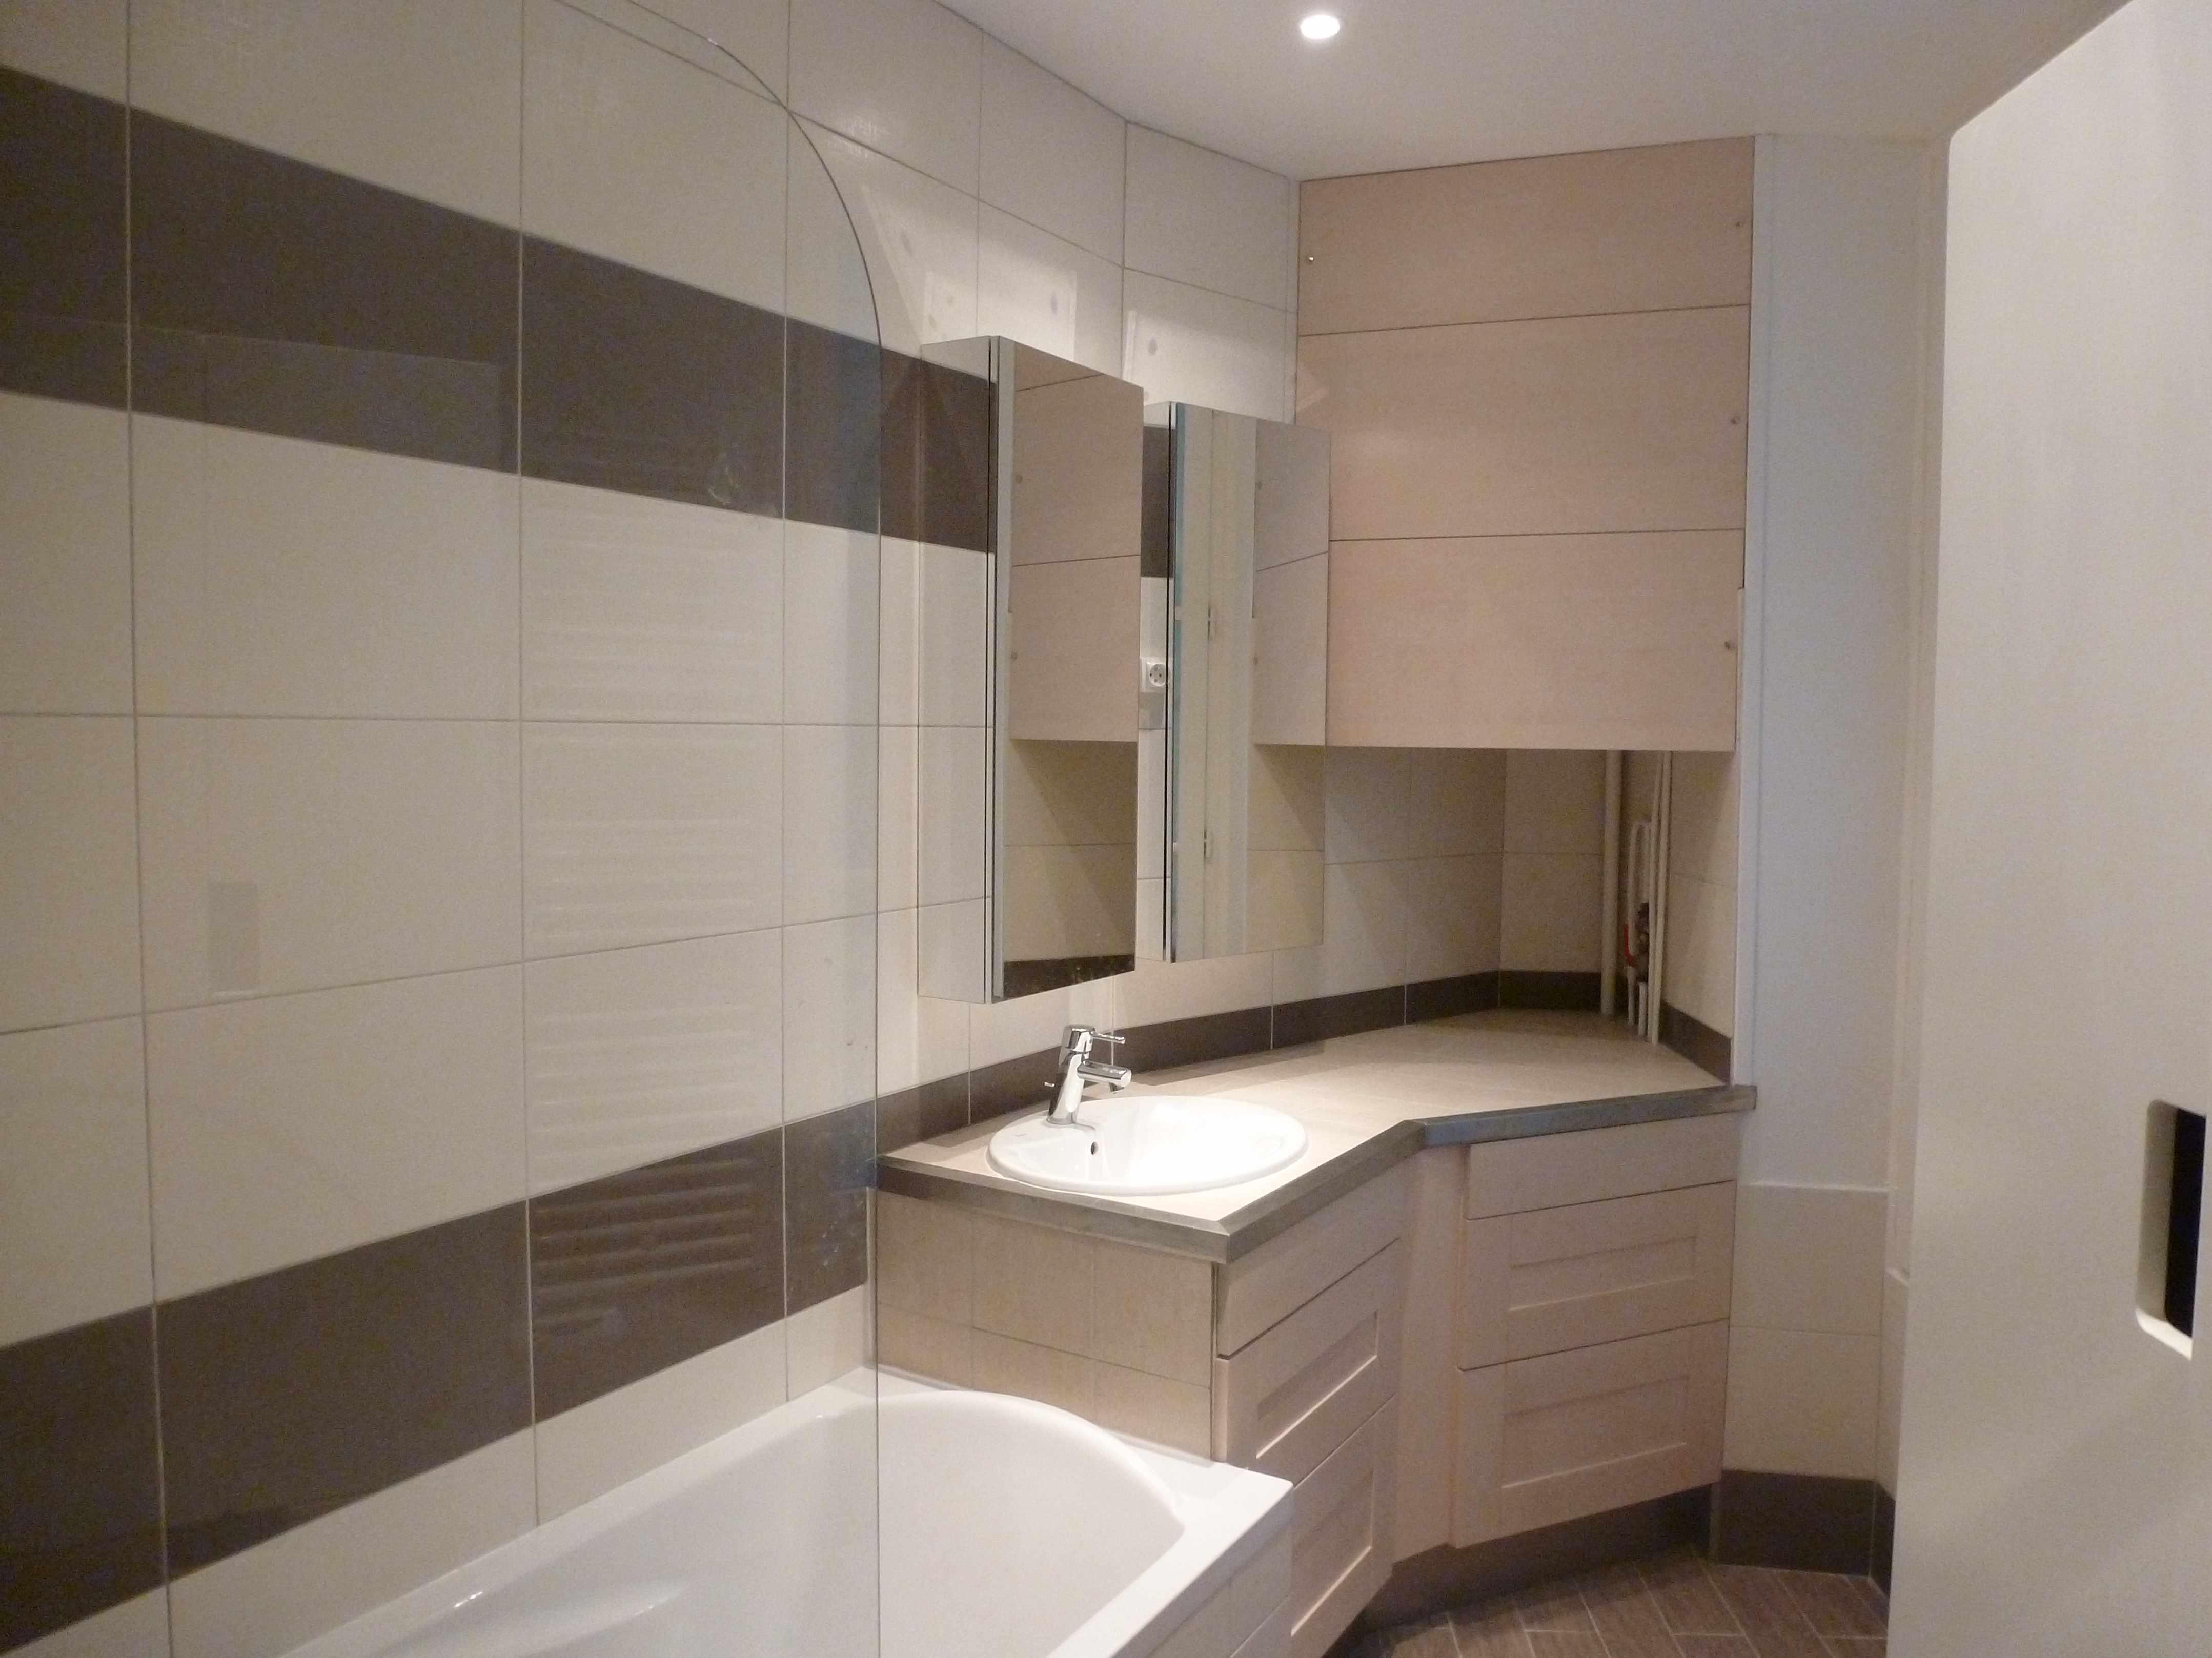 1 an 3 salles de bain 2 brun et blanc - Travaux salle de bain ...